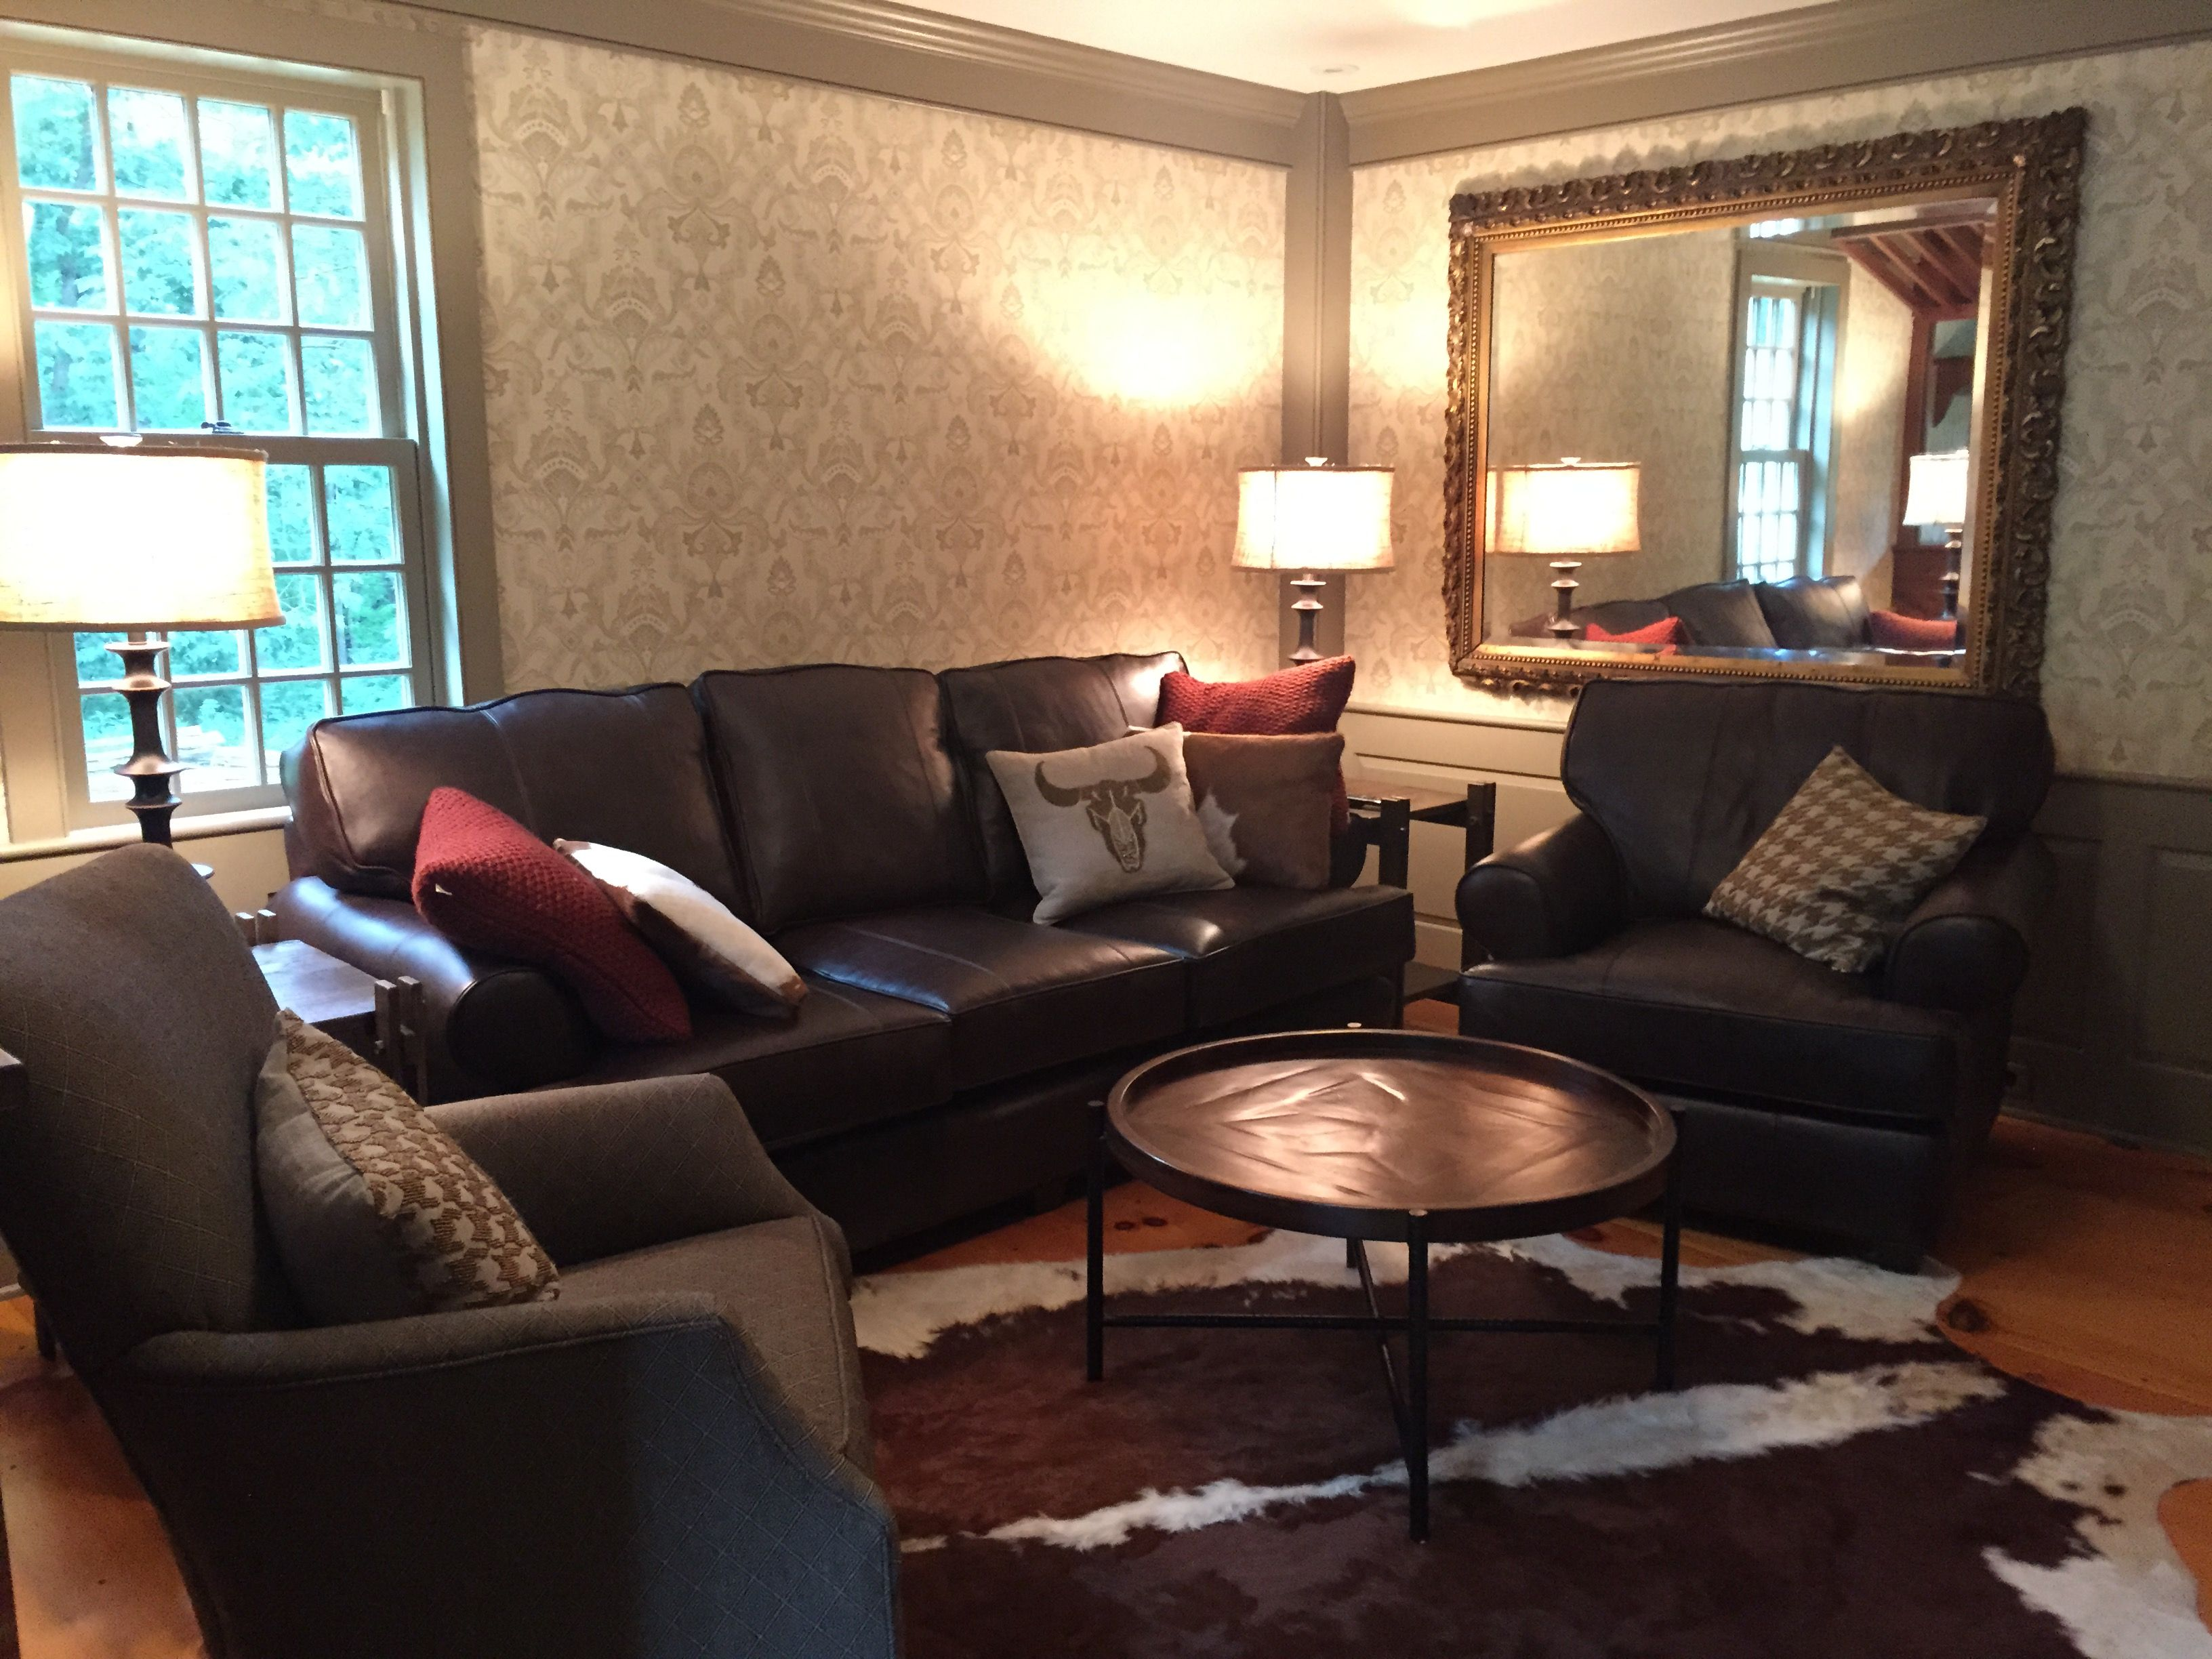 Arhaus Furniture Hadley Leather Sofa & Chair Desmond Bark Swivel